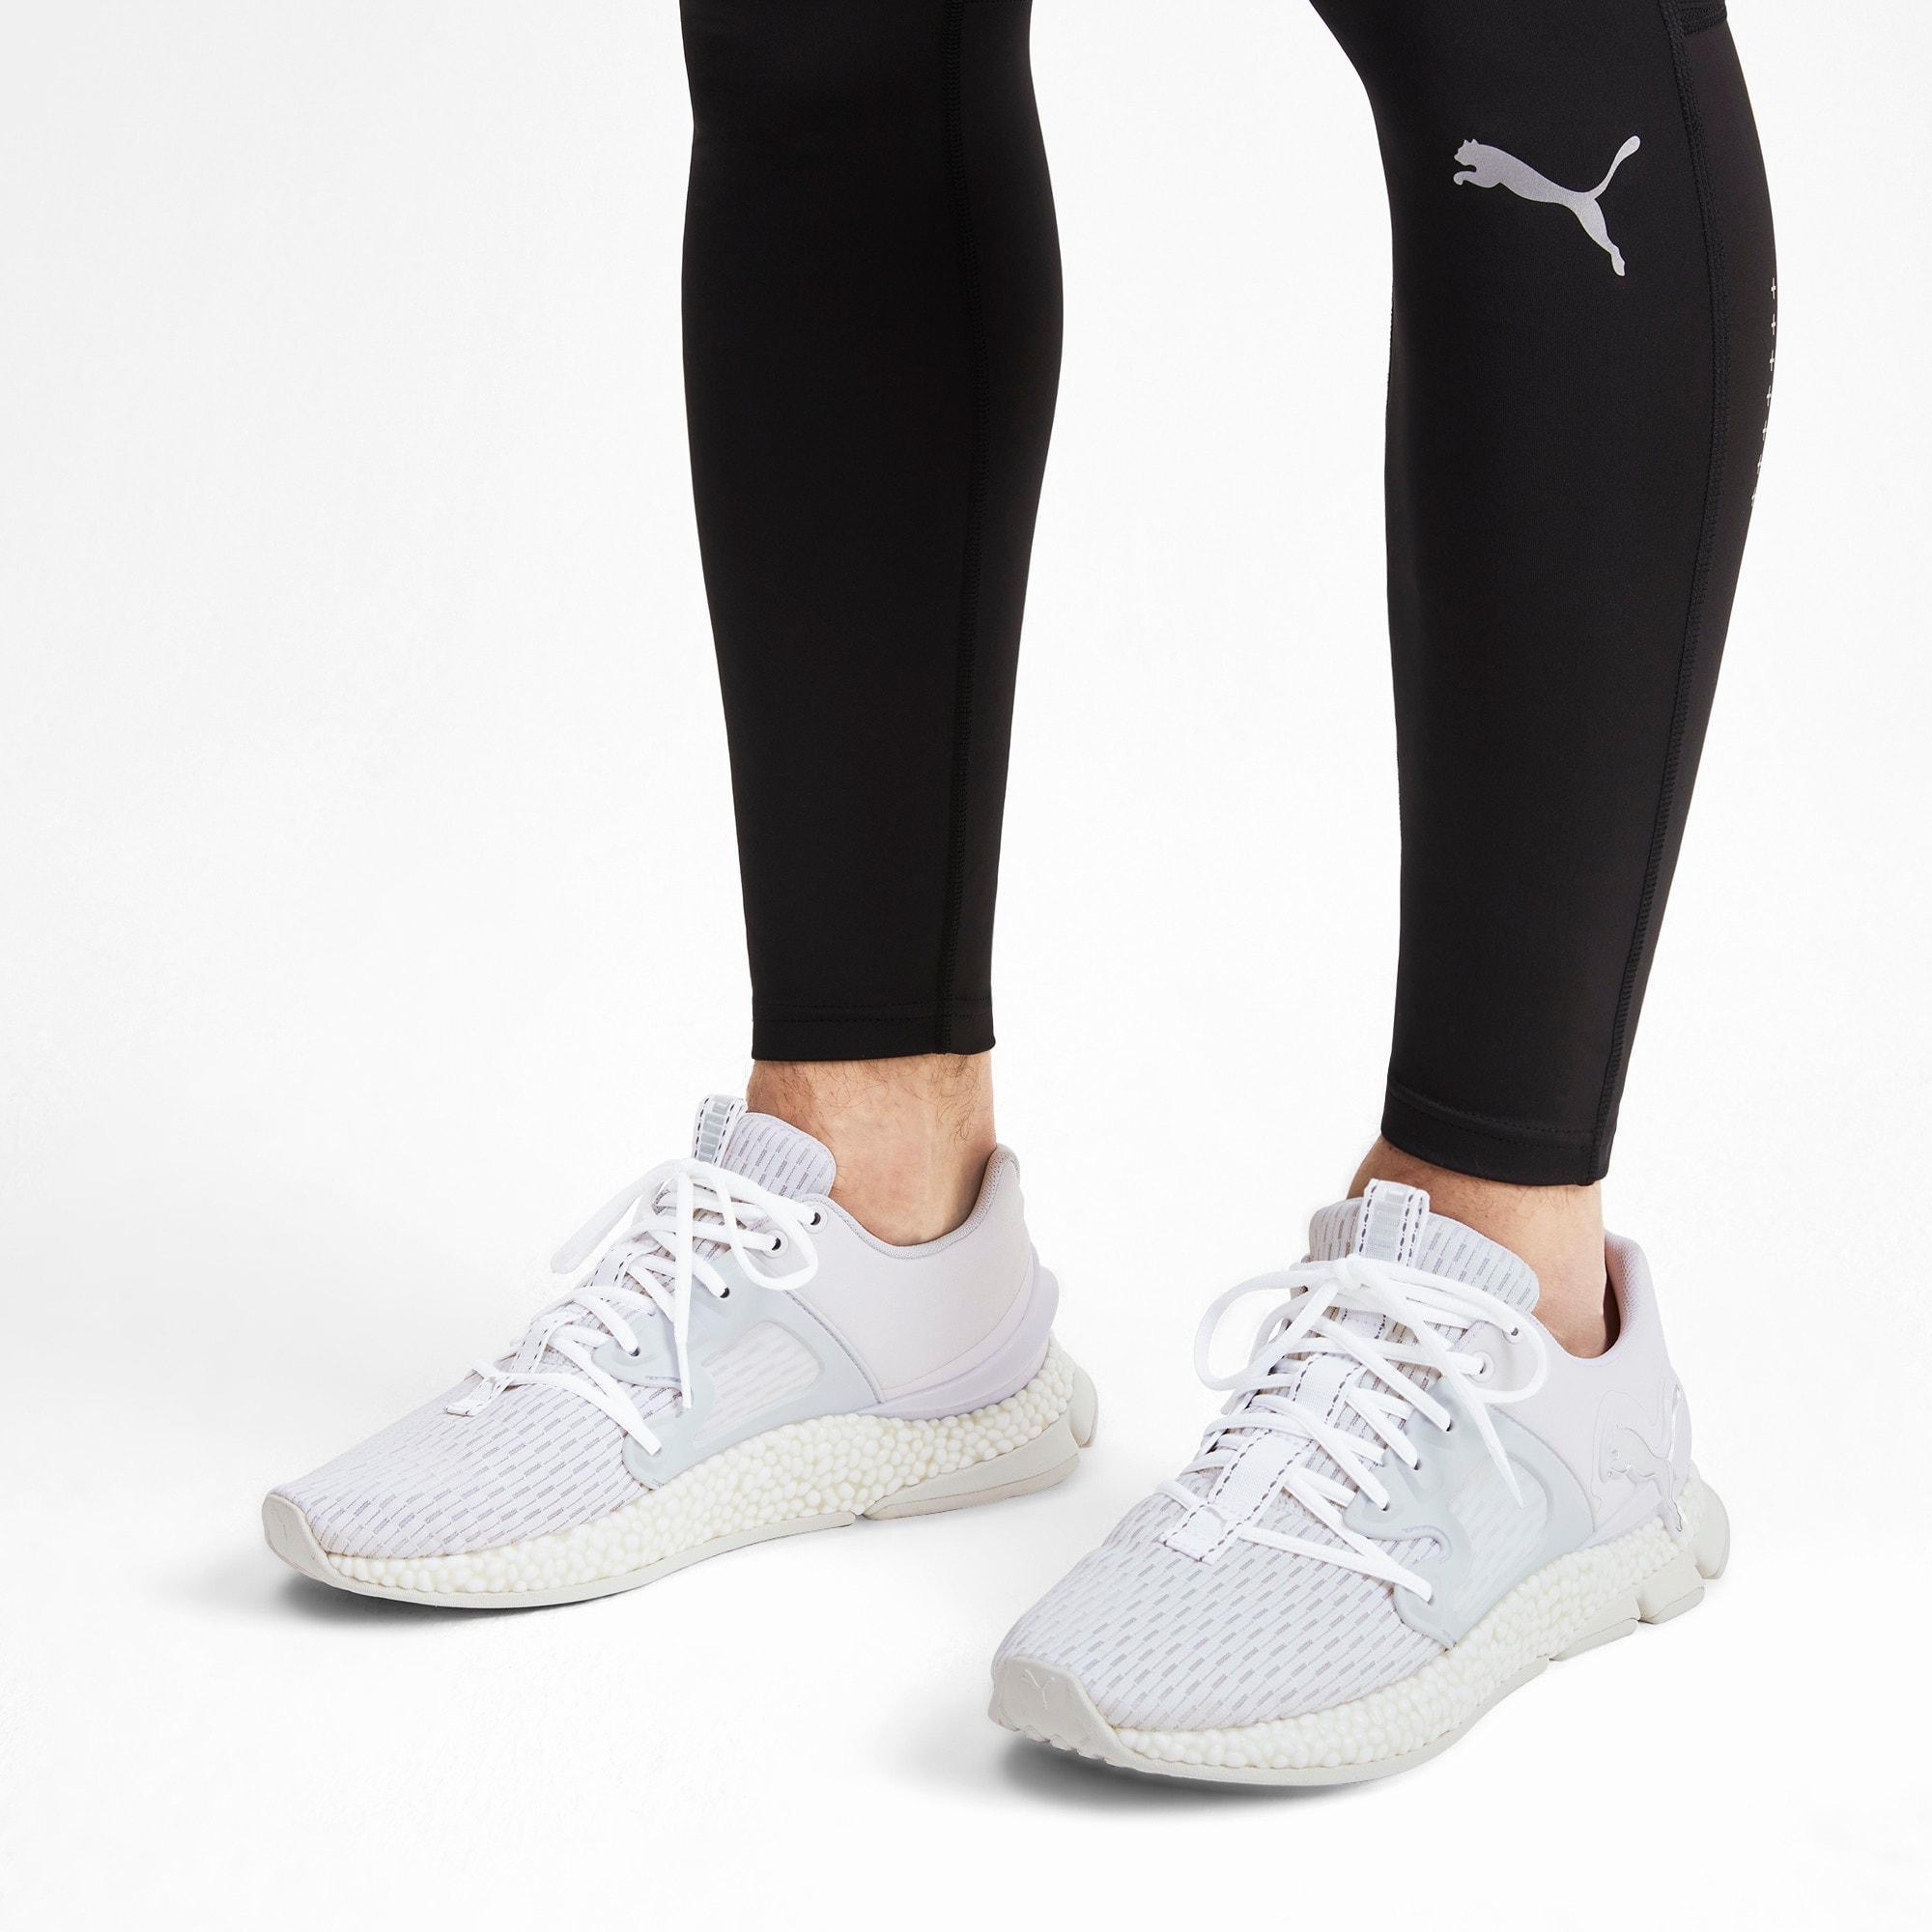 Thumbnail 2 of HYBRID Sky Lights Men's Running Shoes, Puma White-Puma Silver, medium